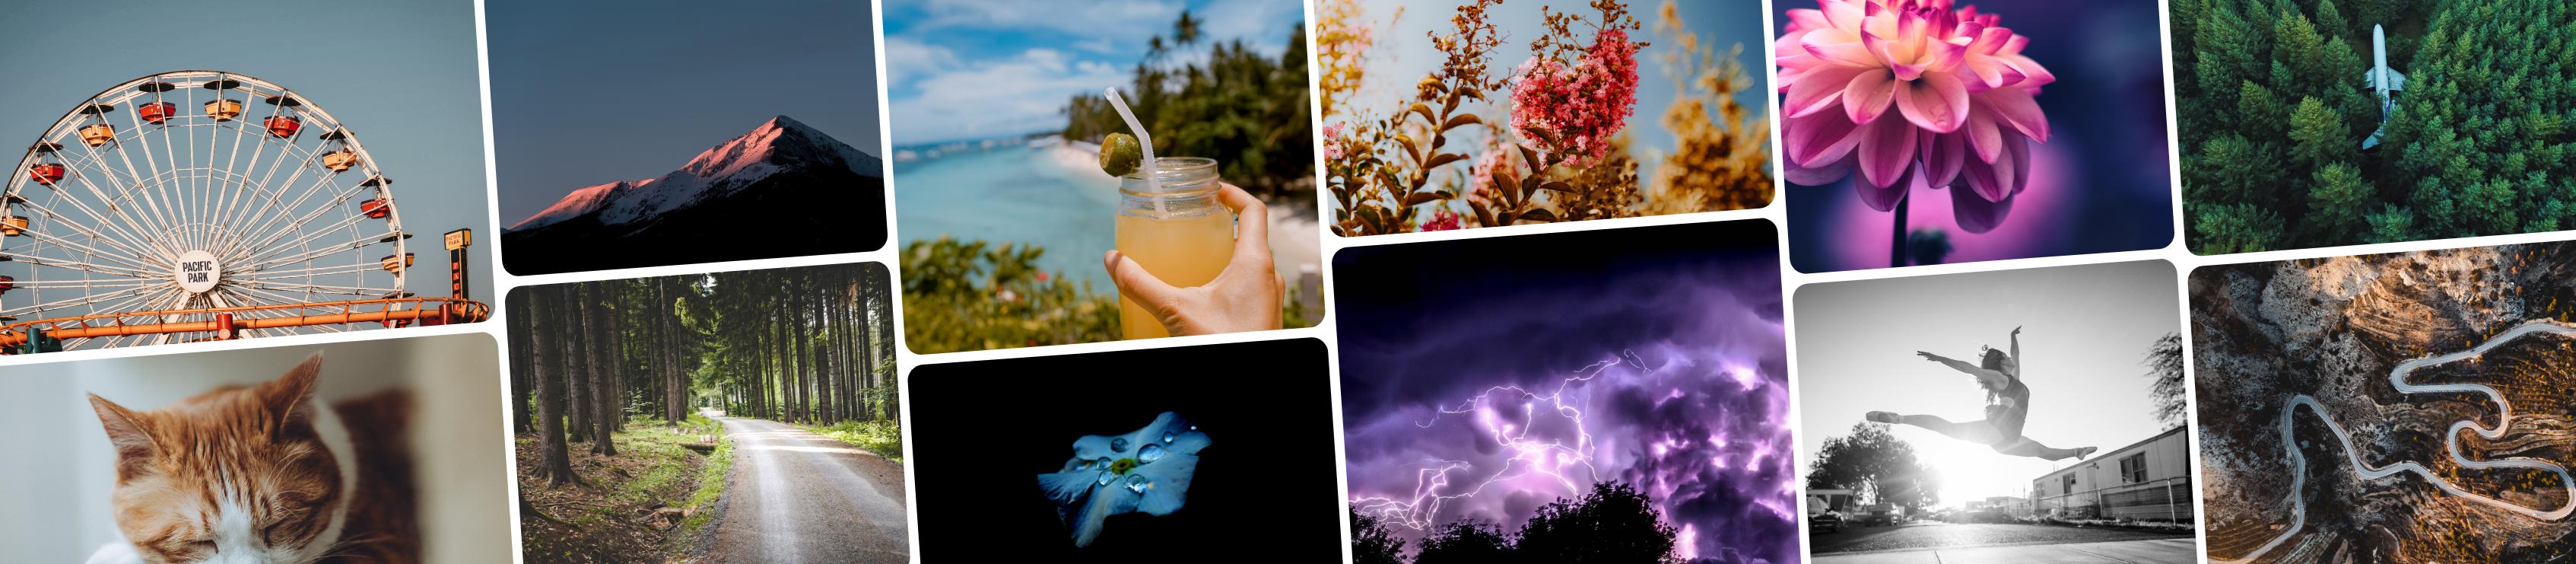 Breathtaking Photography – Week 8